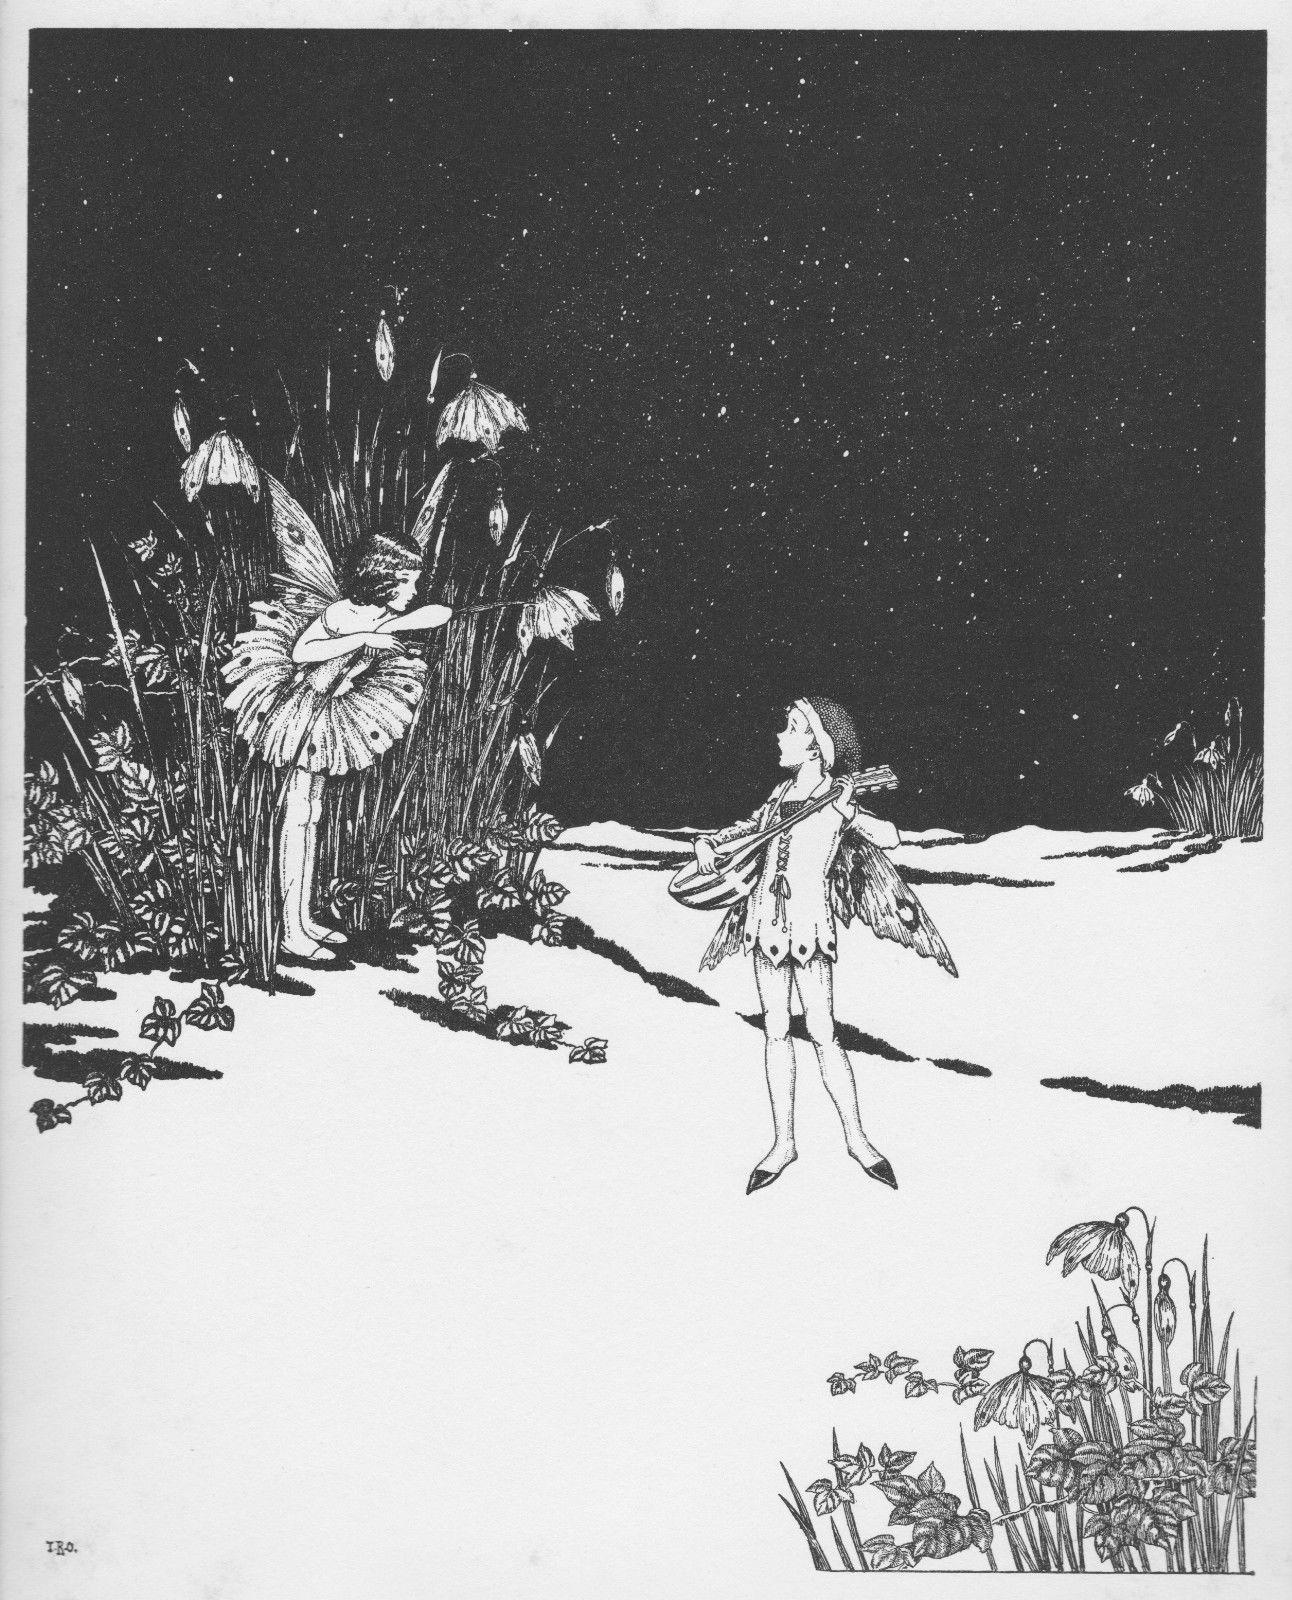 Ida Rentoul Outhwaite 'Breath of Spring' 1931 | eBay